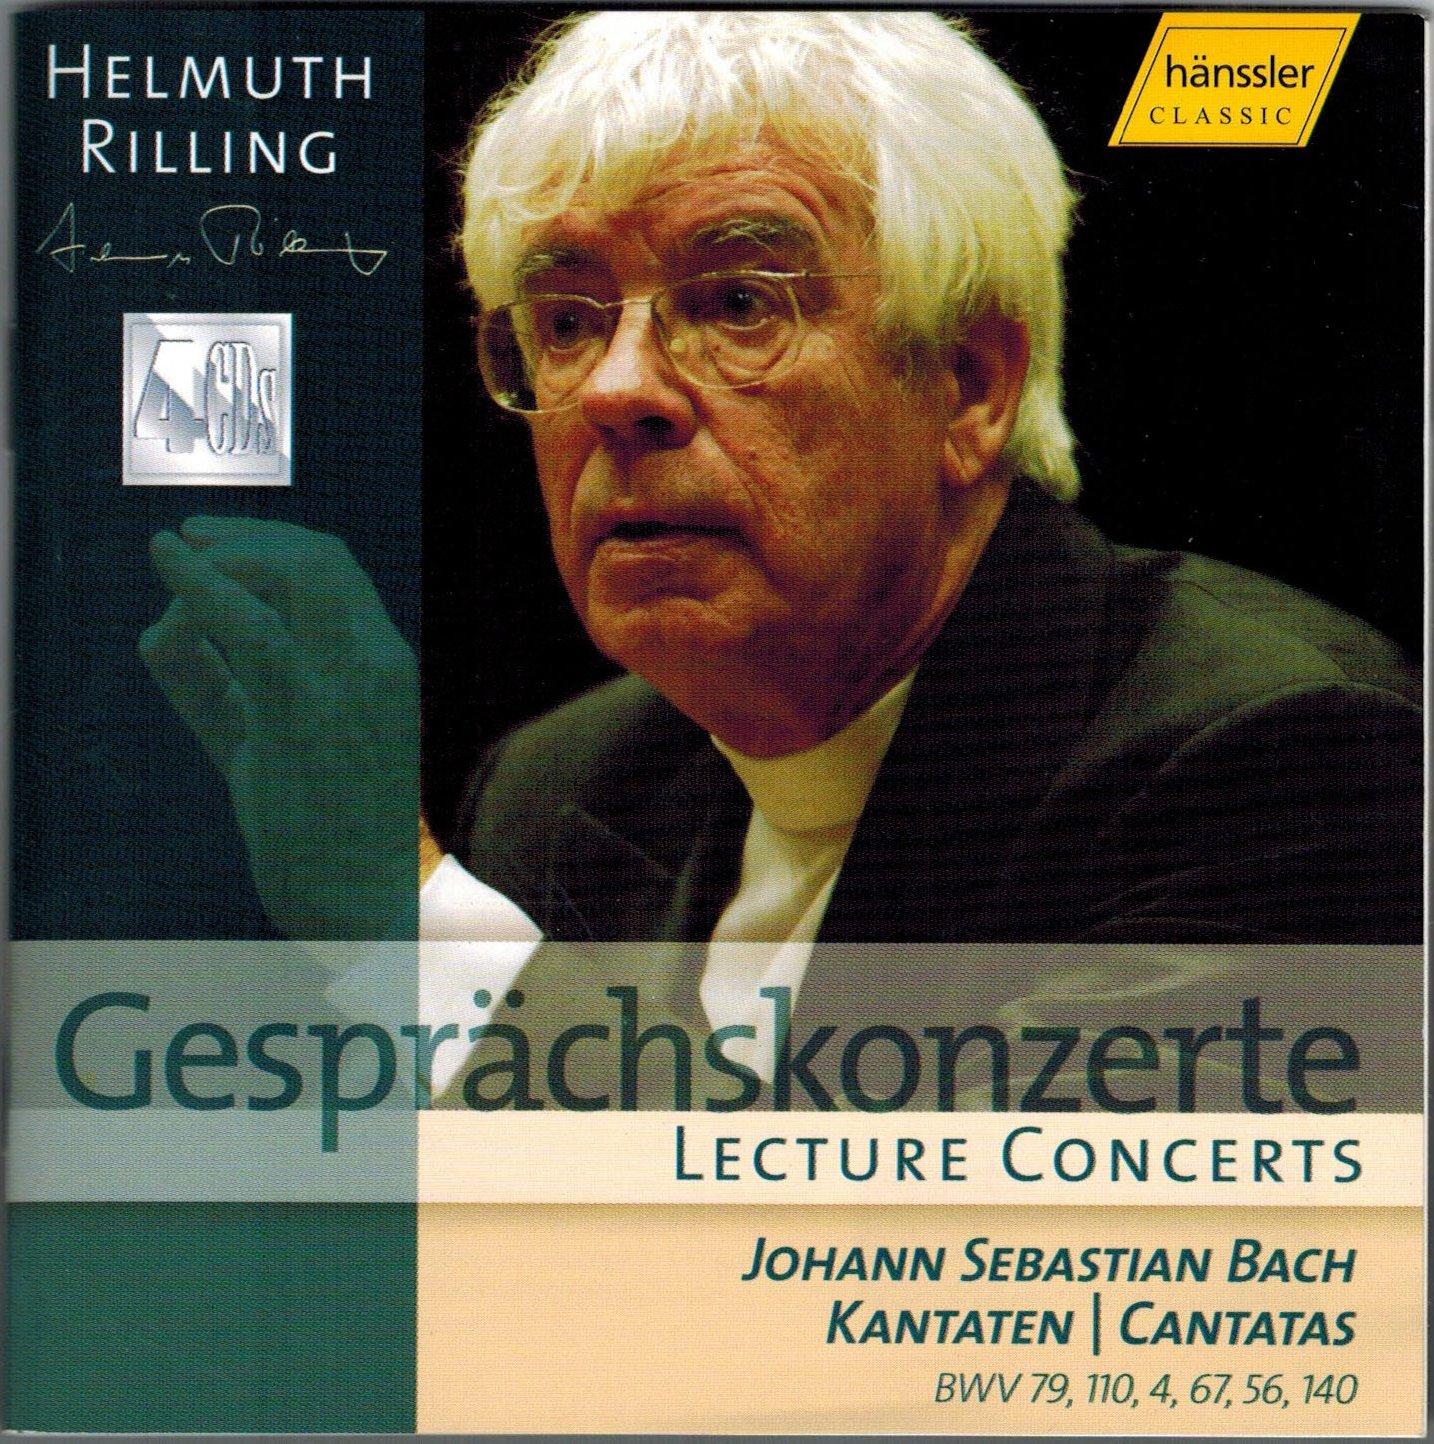 JOHANN SEBASTIAN BACH, Lecture Concerts